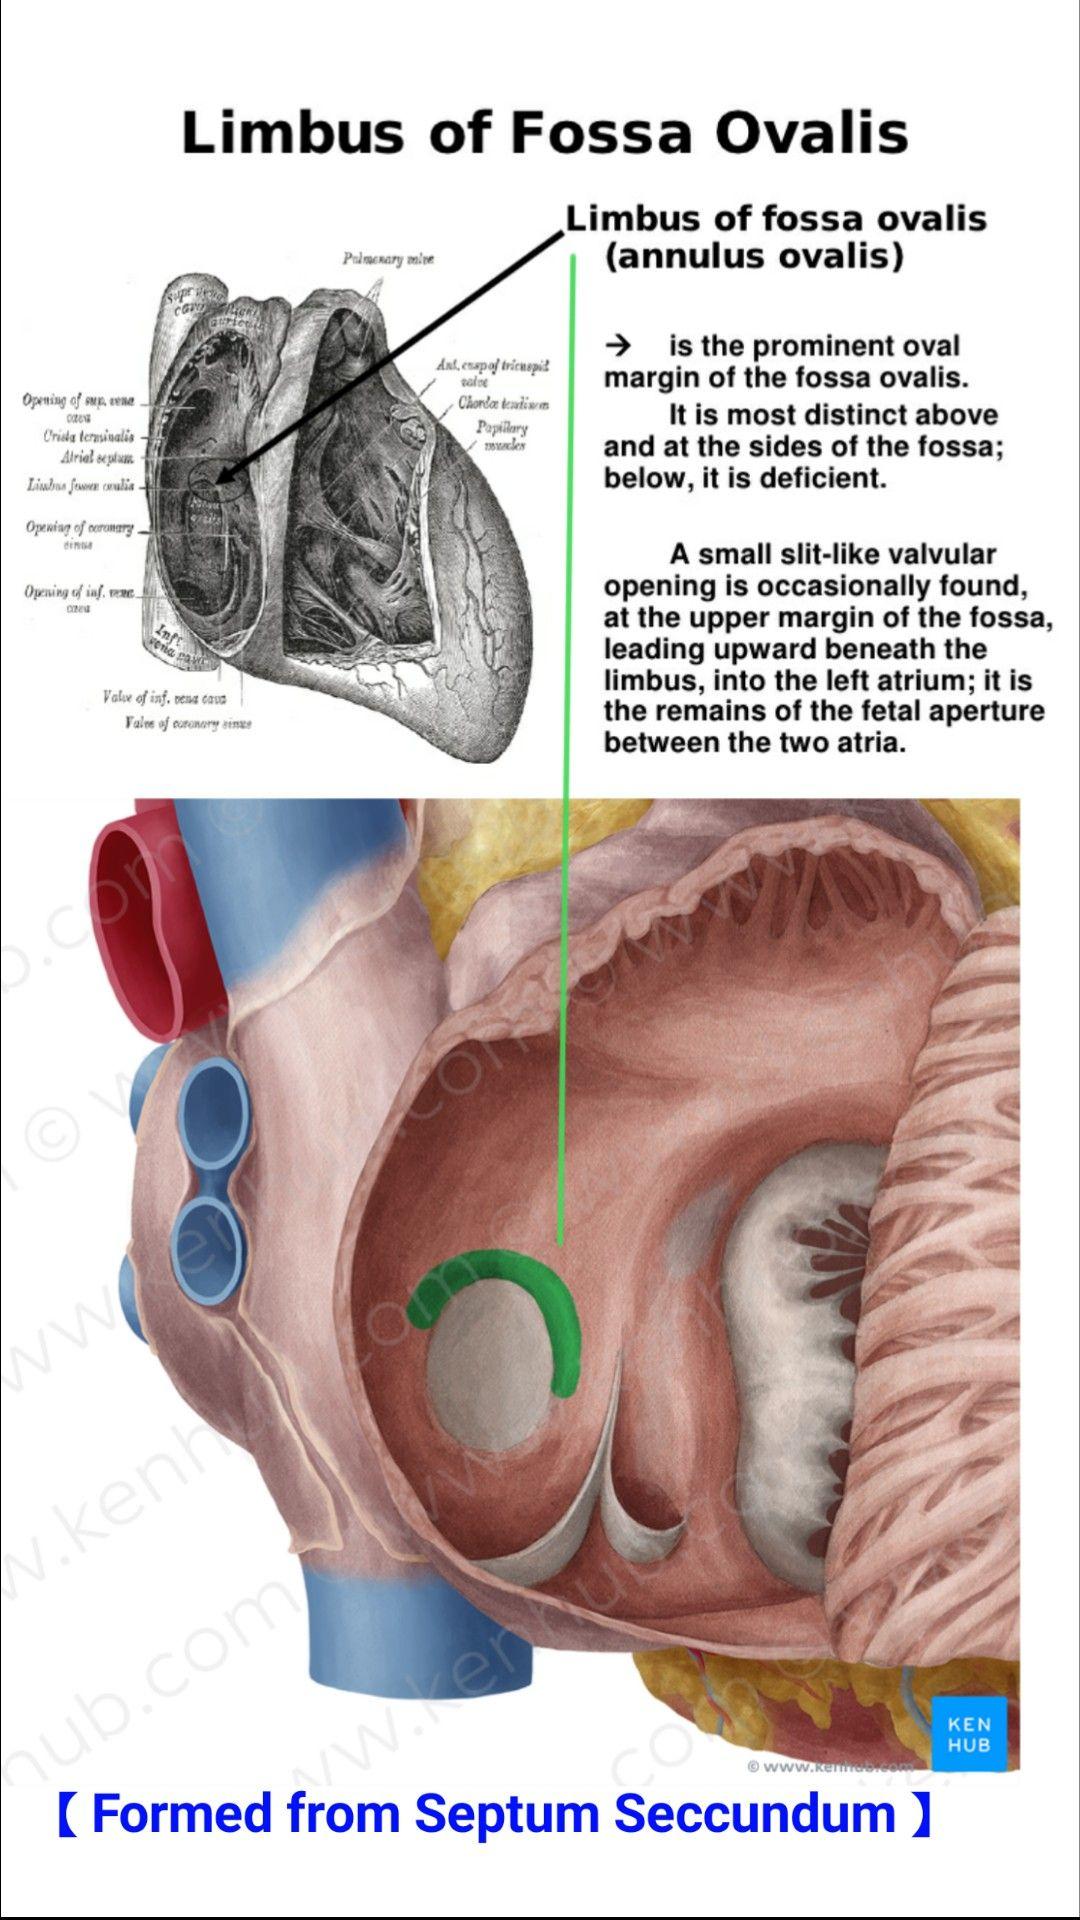 Limbus Fossa Ovalis Embryology Pinterest Anatomy